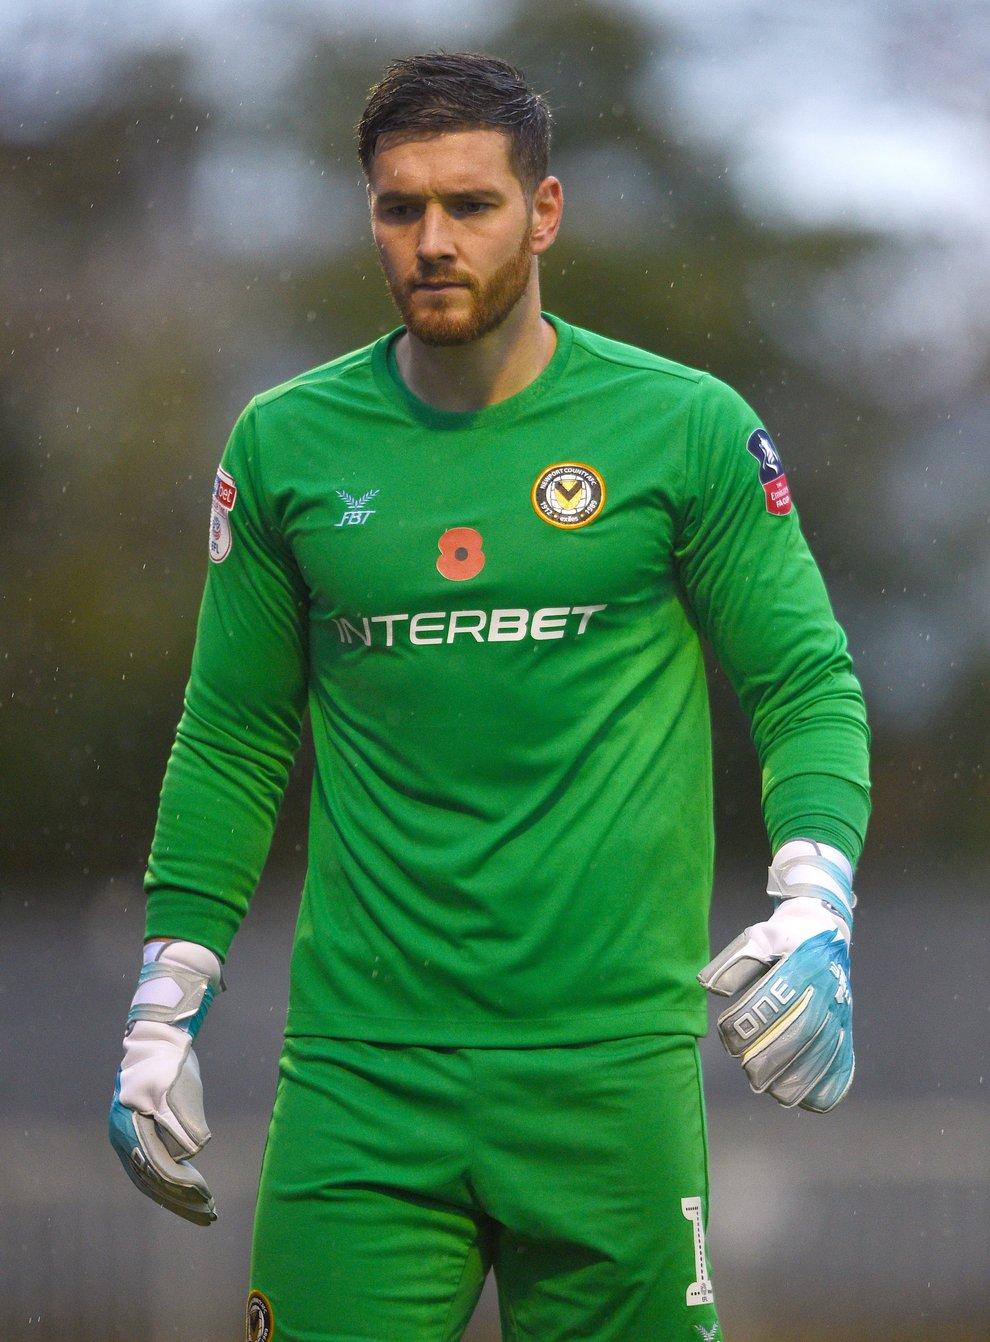 Joe Day has re-joined Newport